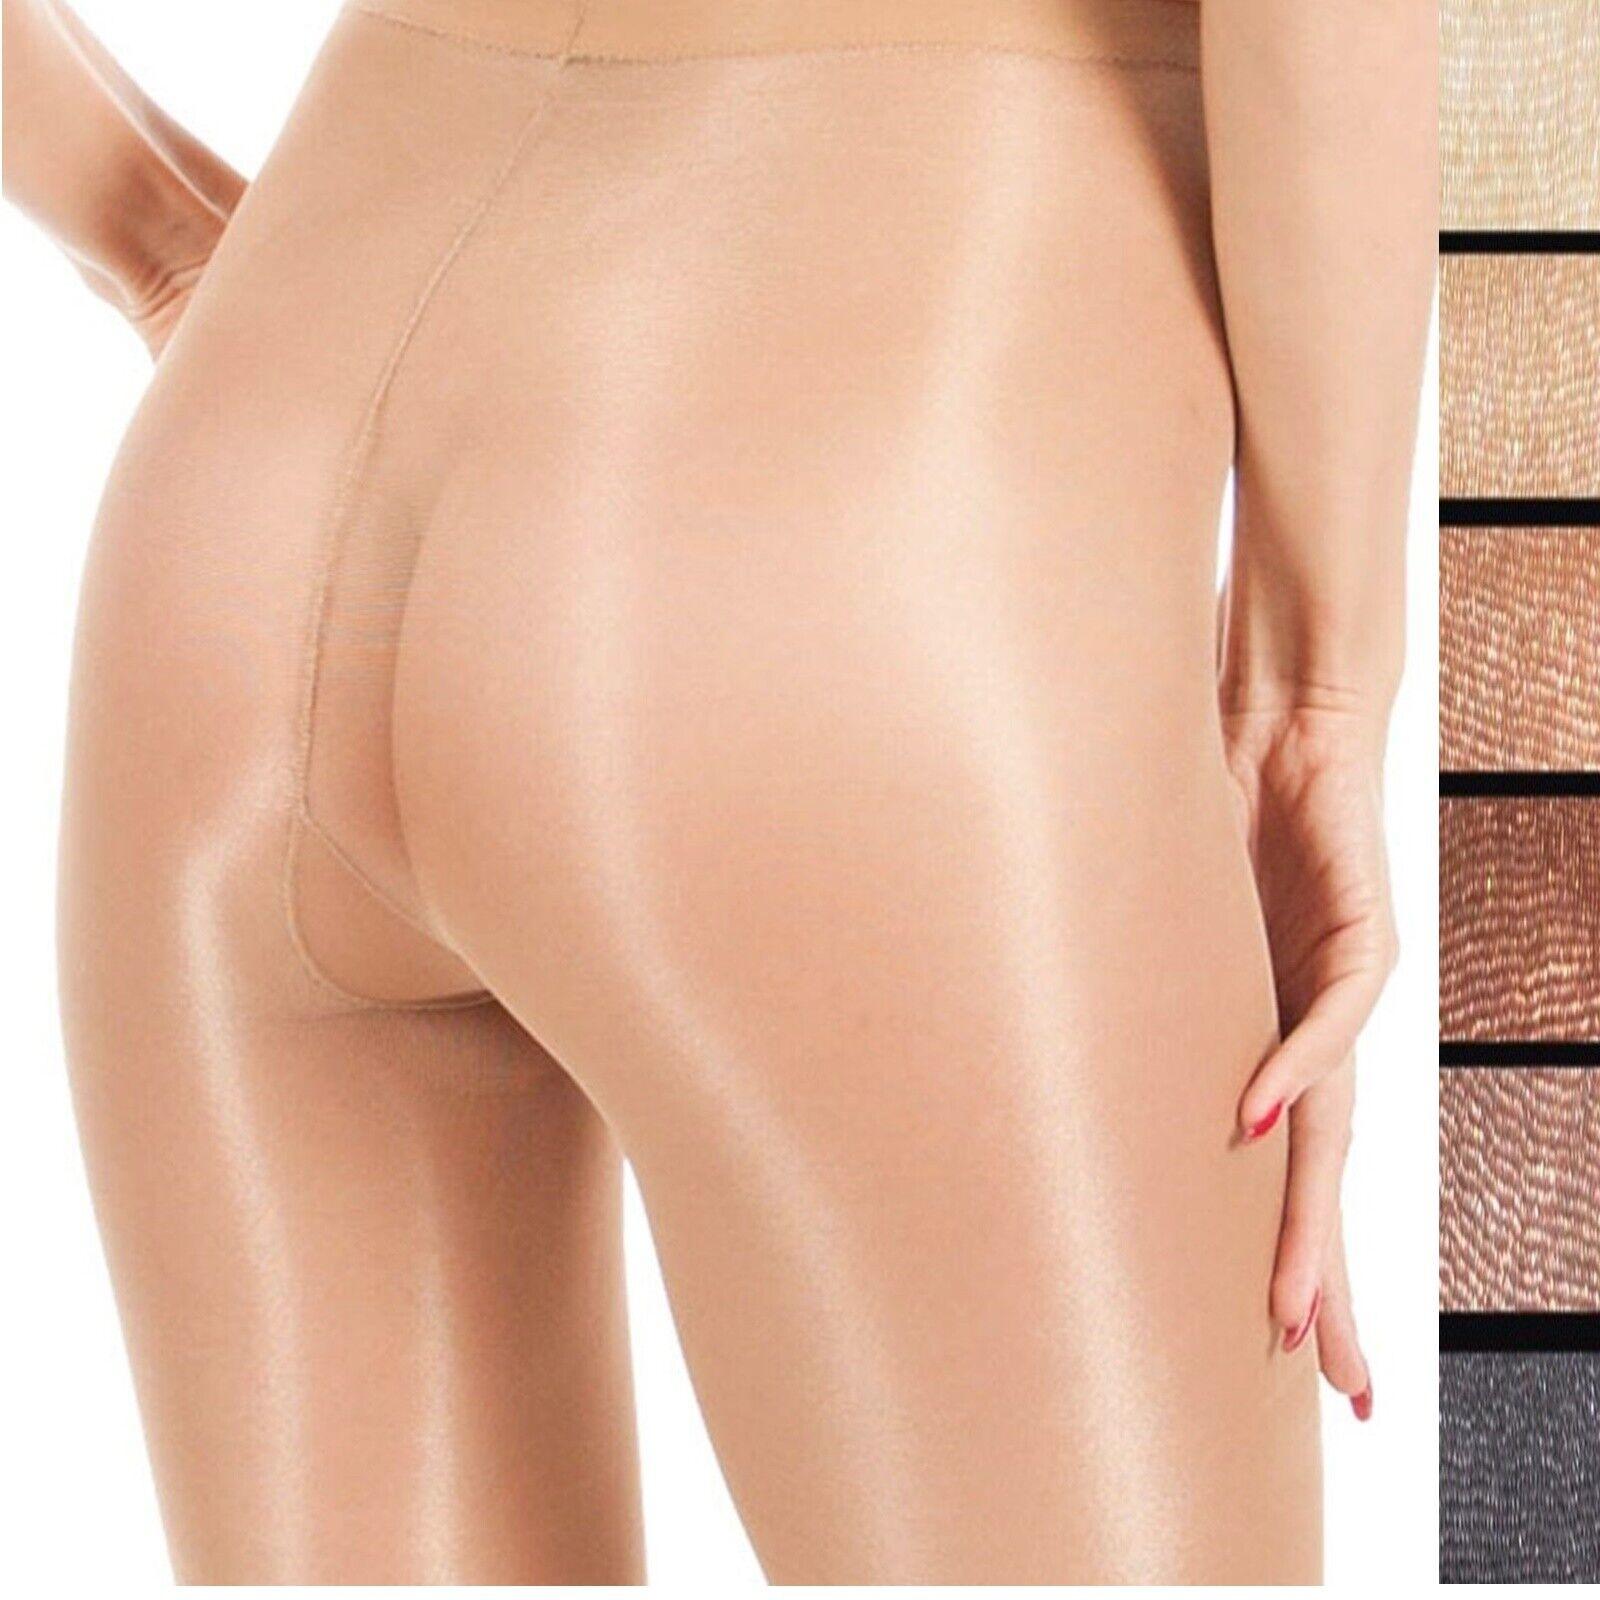 Nudo Glossy Glanz Satin-Strumpfhose 20 den glänzend Farben T-Band transparent